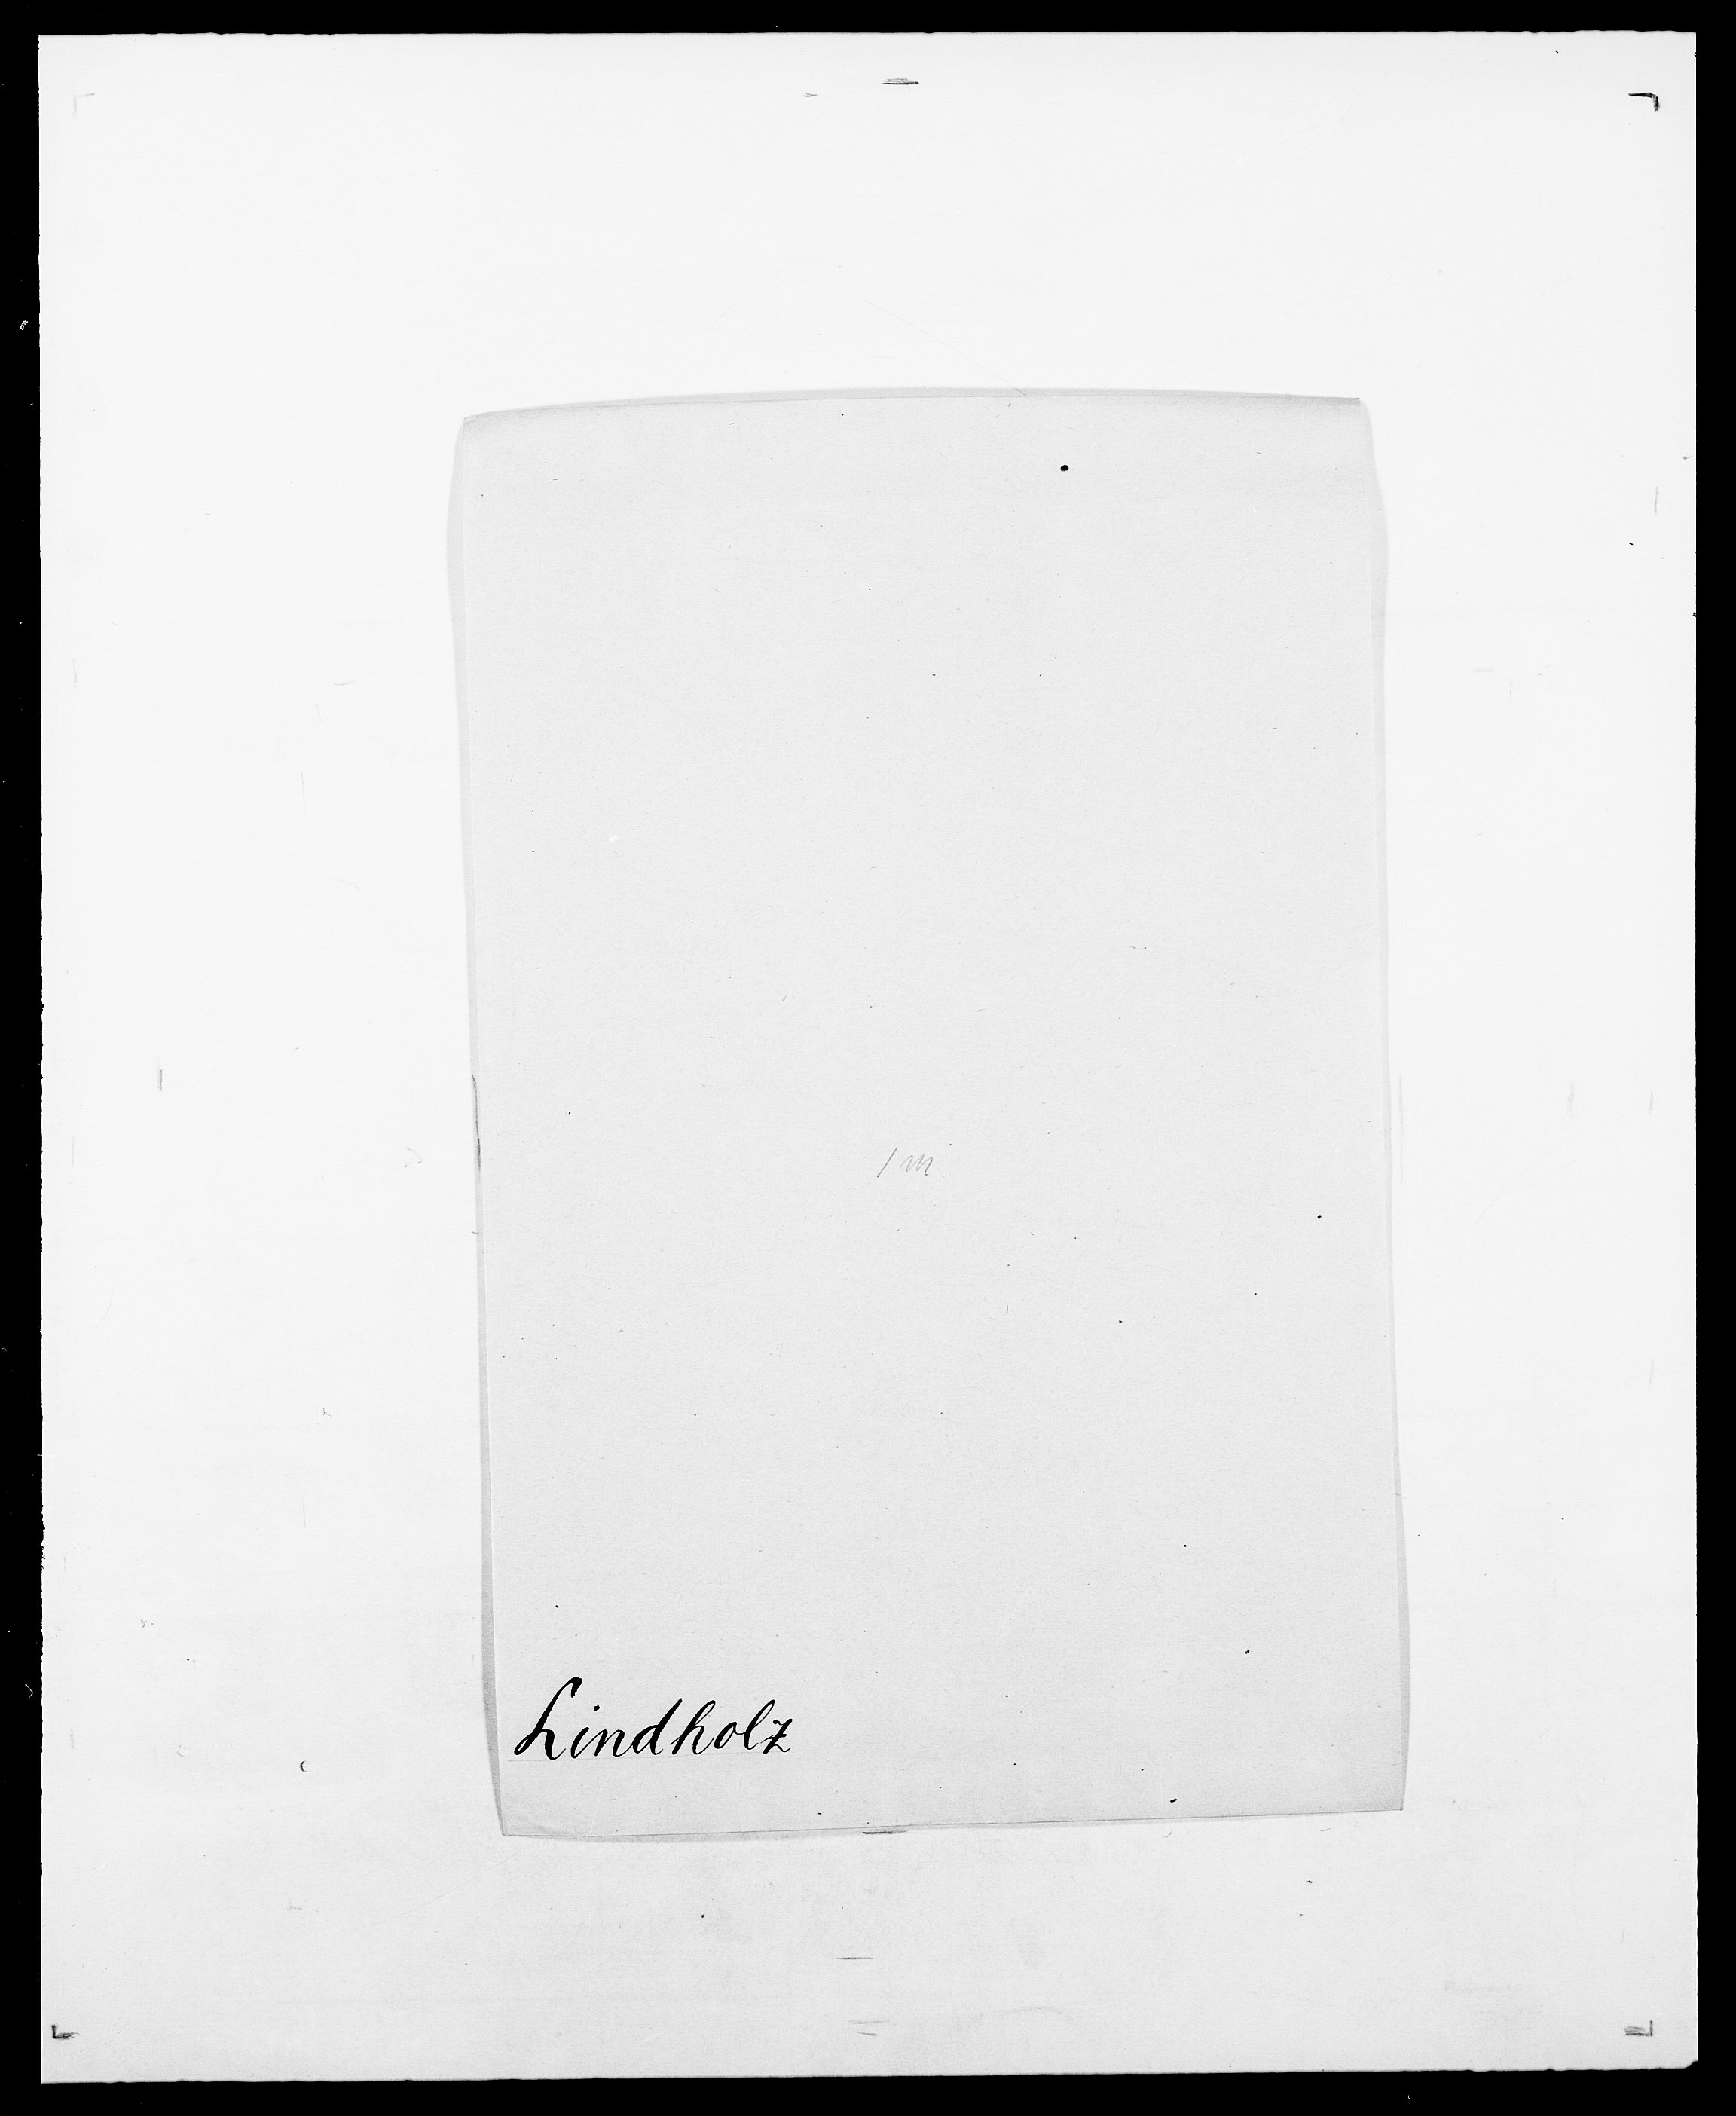 SAO, Delgobe, Charles Antoine - samling, D/Da/L0023: Lau - Lirvyn, s. 615